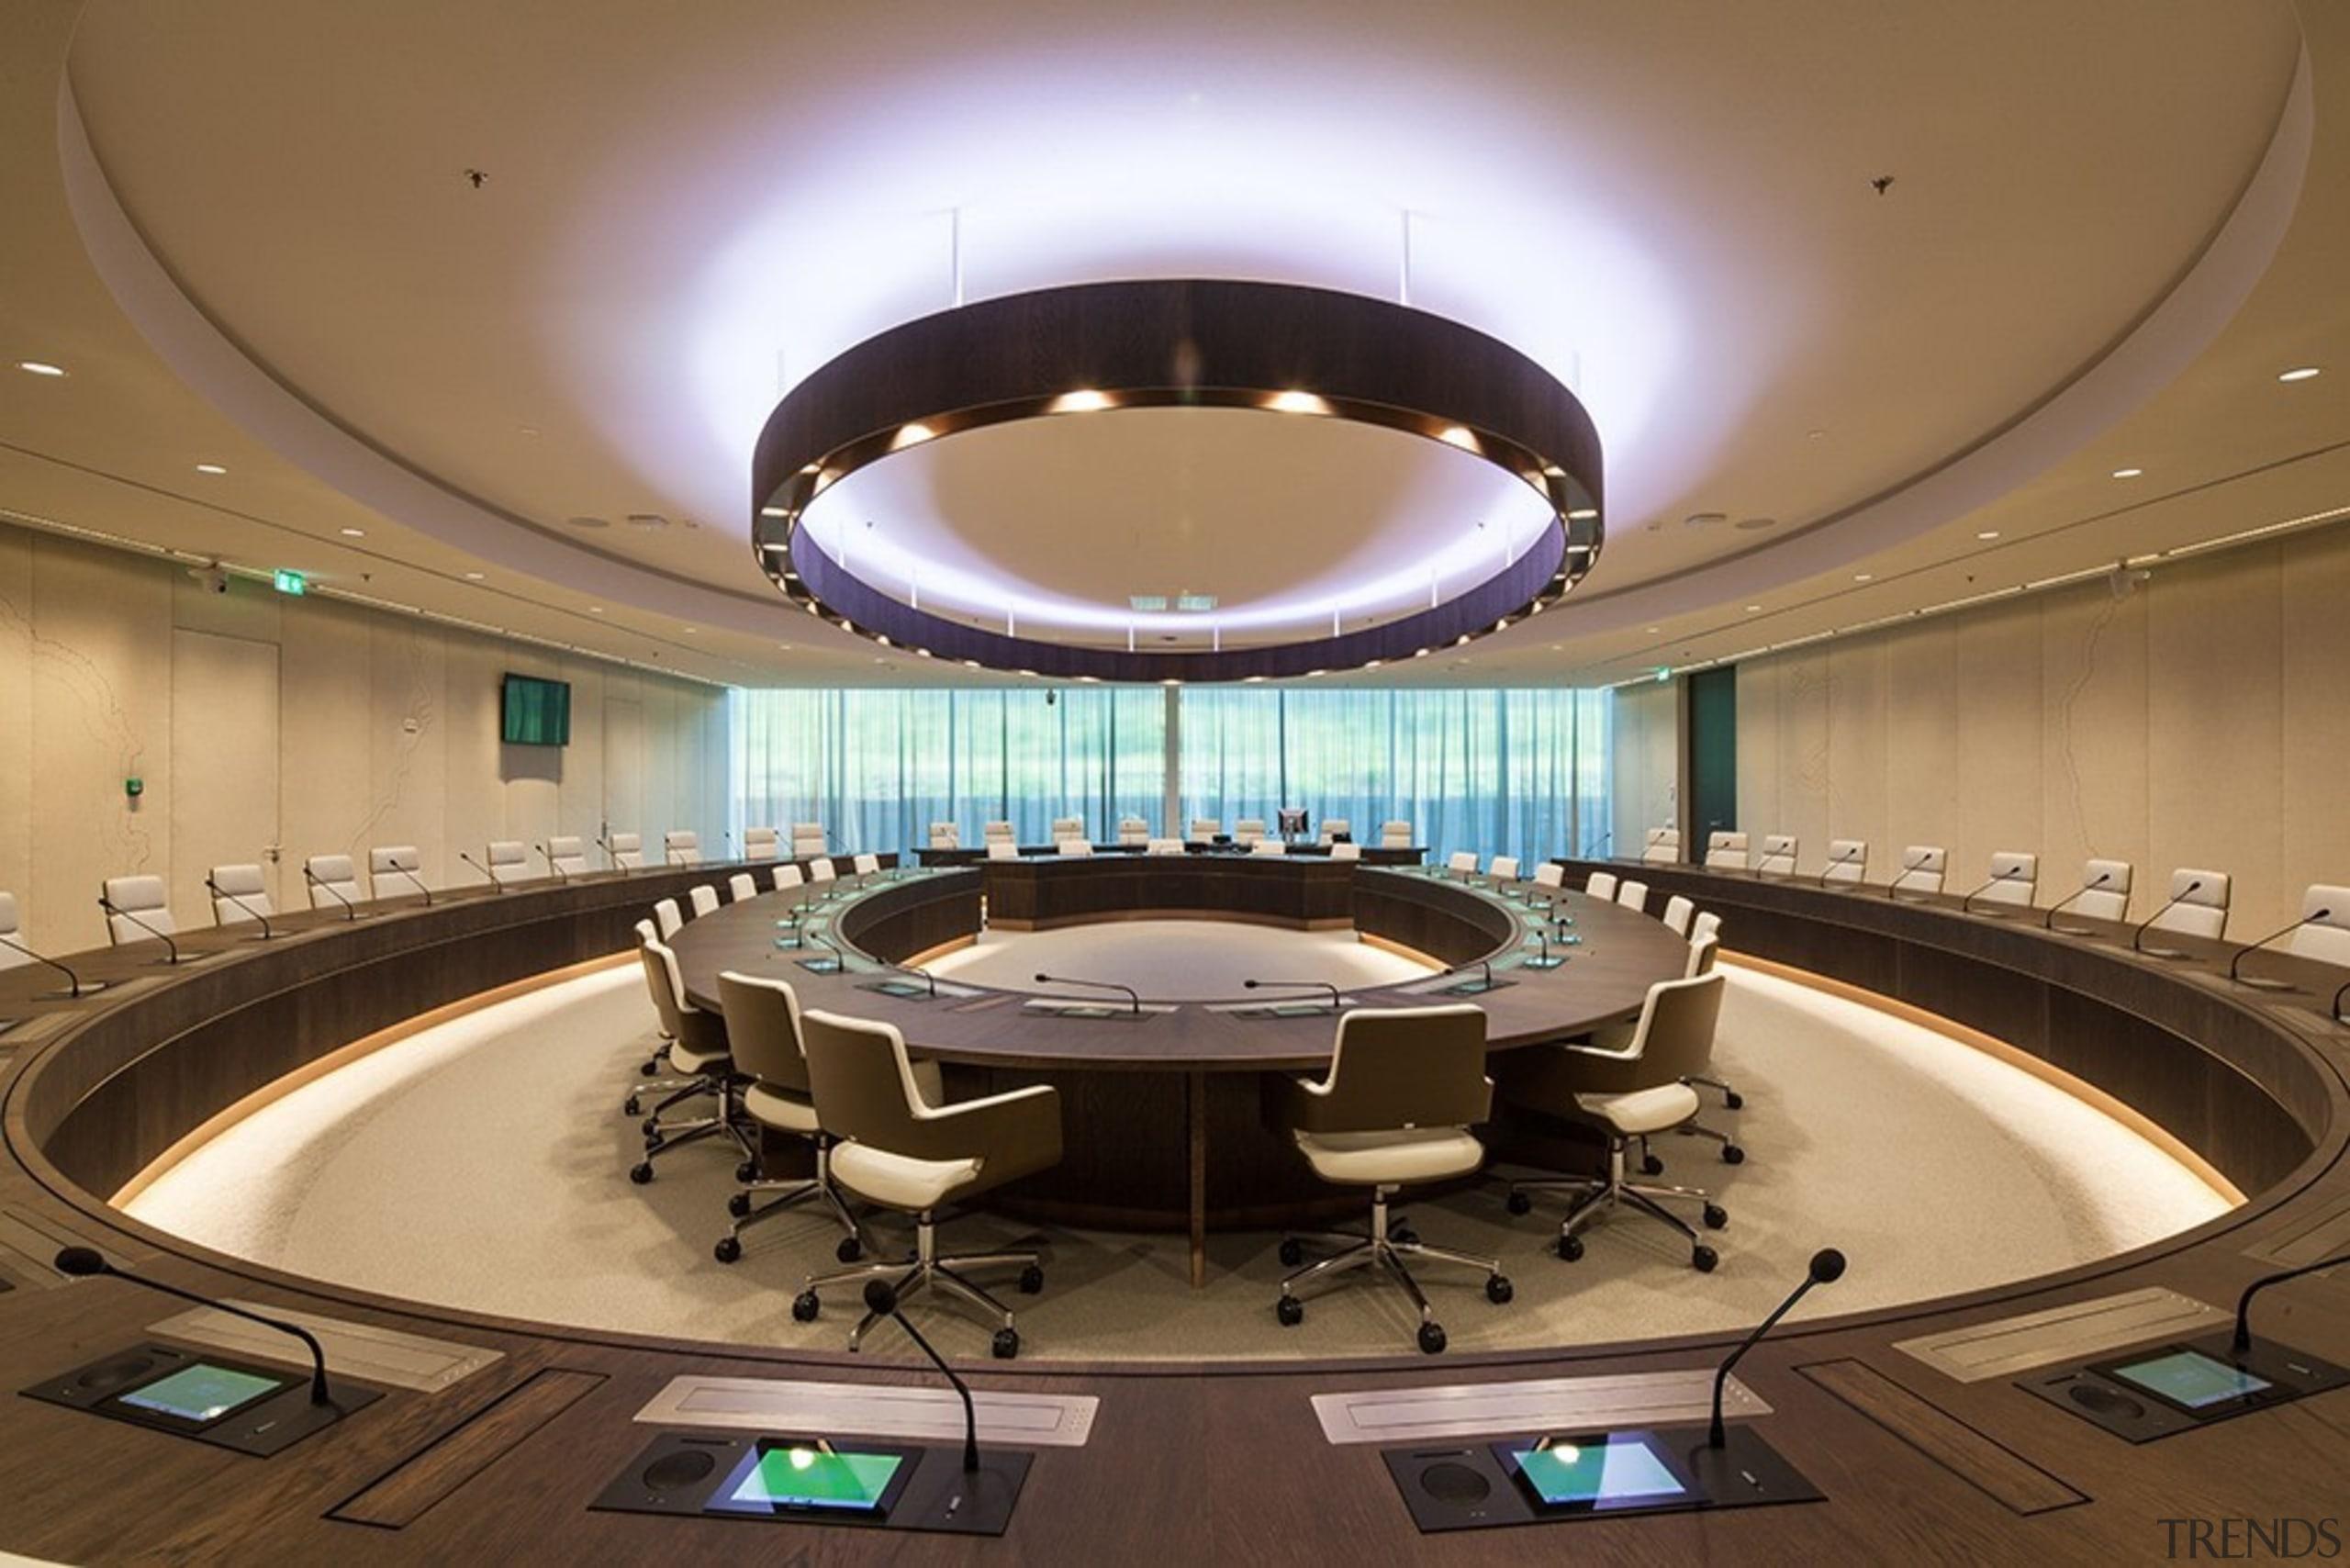 Eurojust - auditorium | ceiling | conference hall auditorium, ceiling, conference hall, interior design, brown